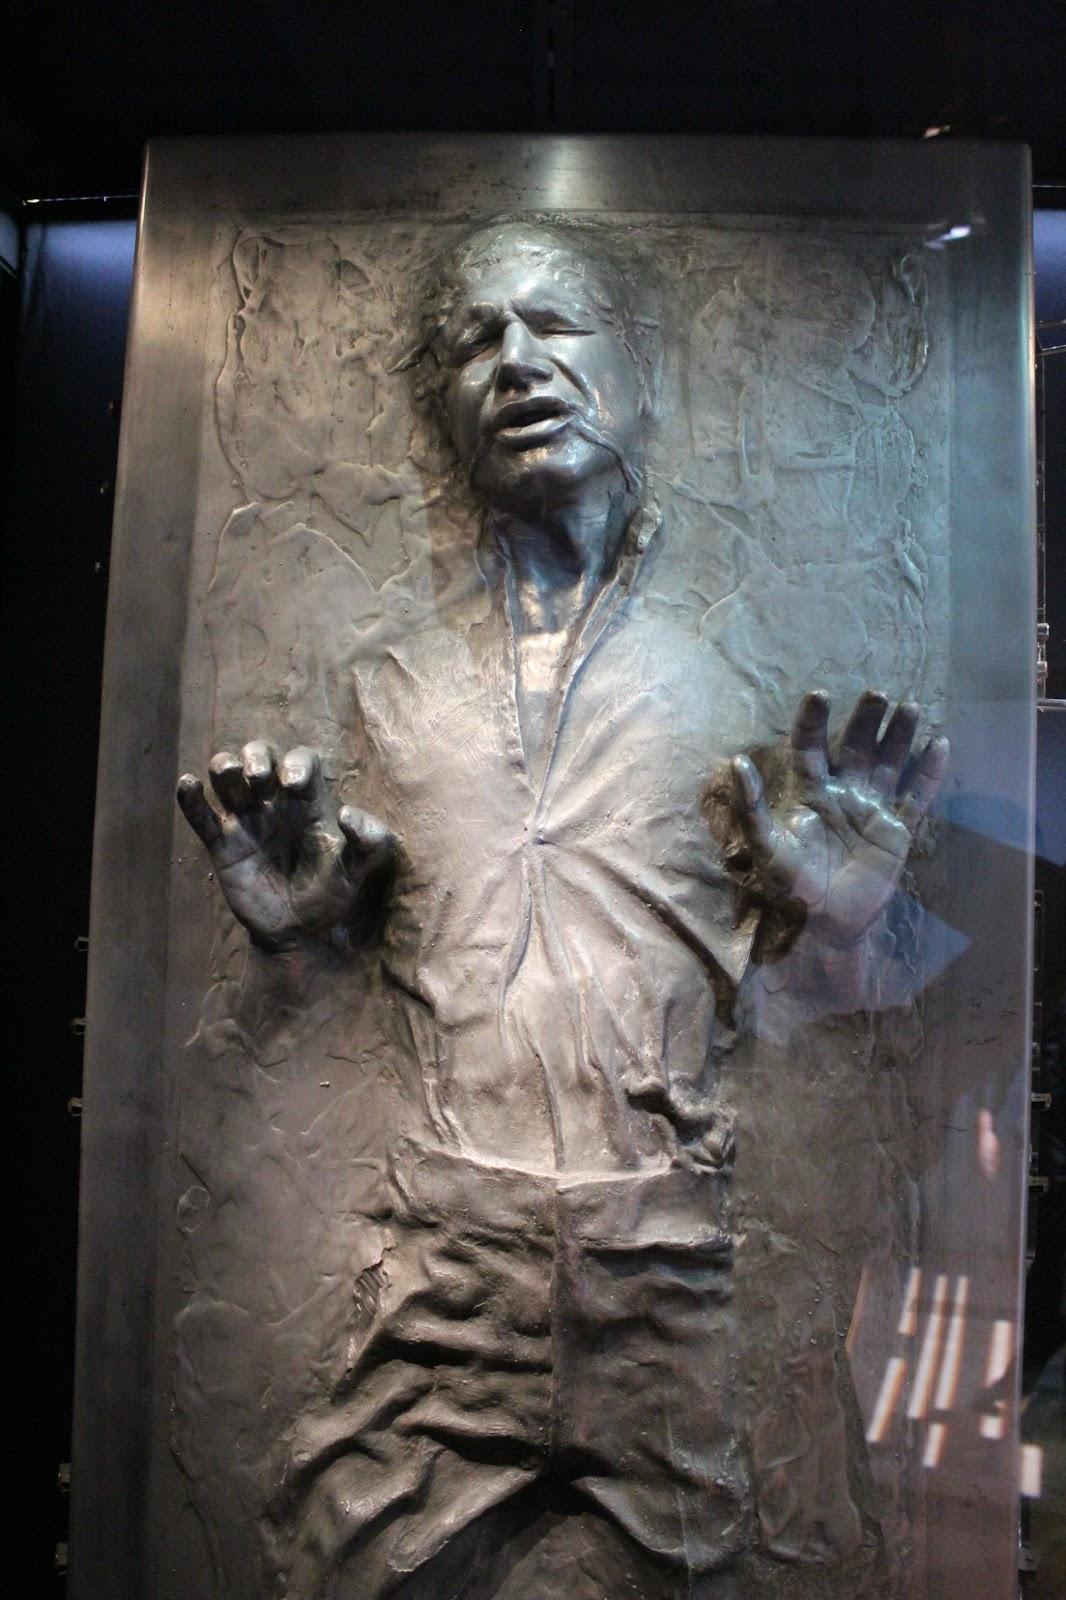 Model of Han Solo frozen in carbonite